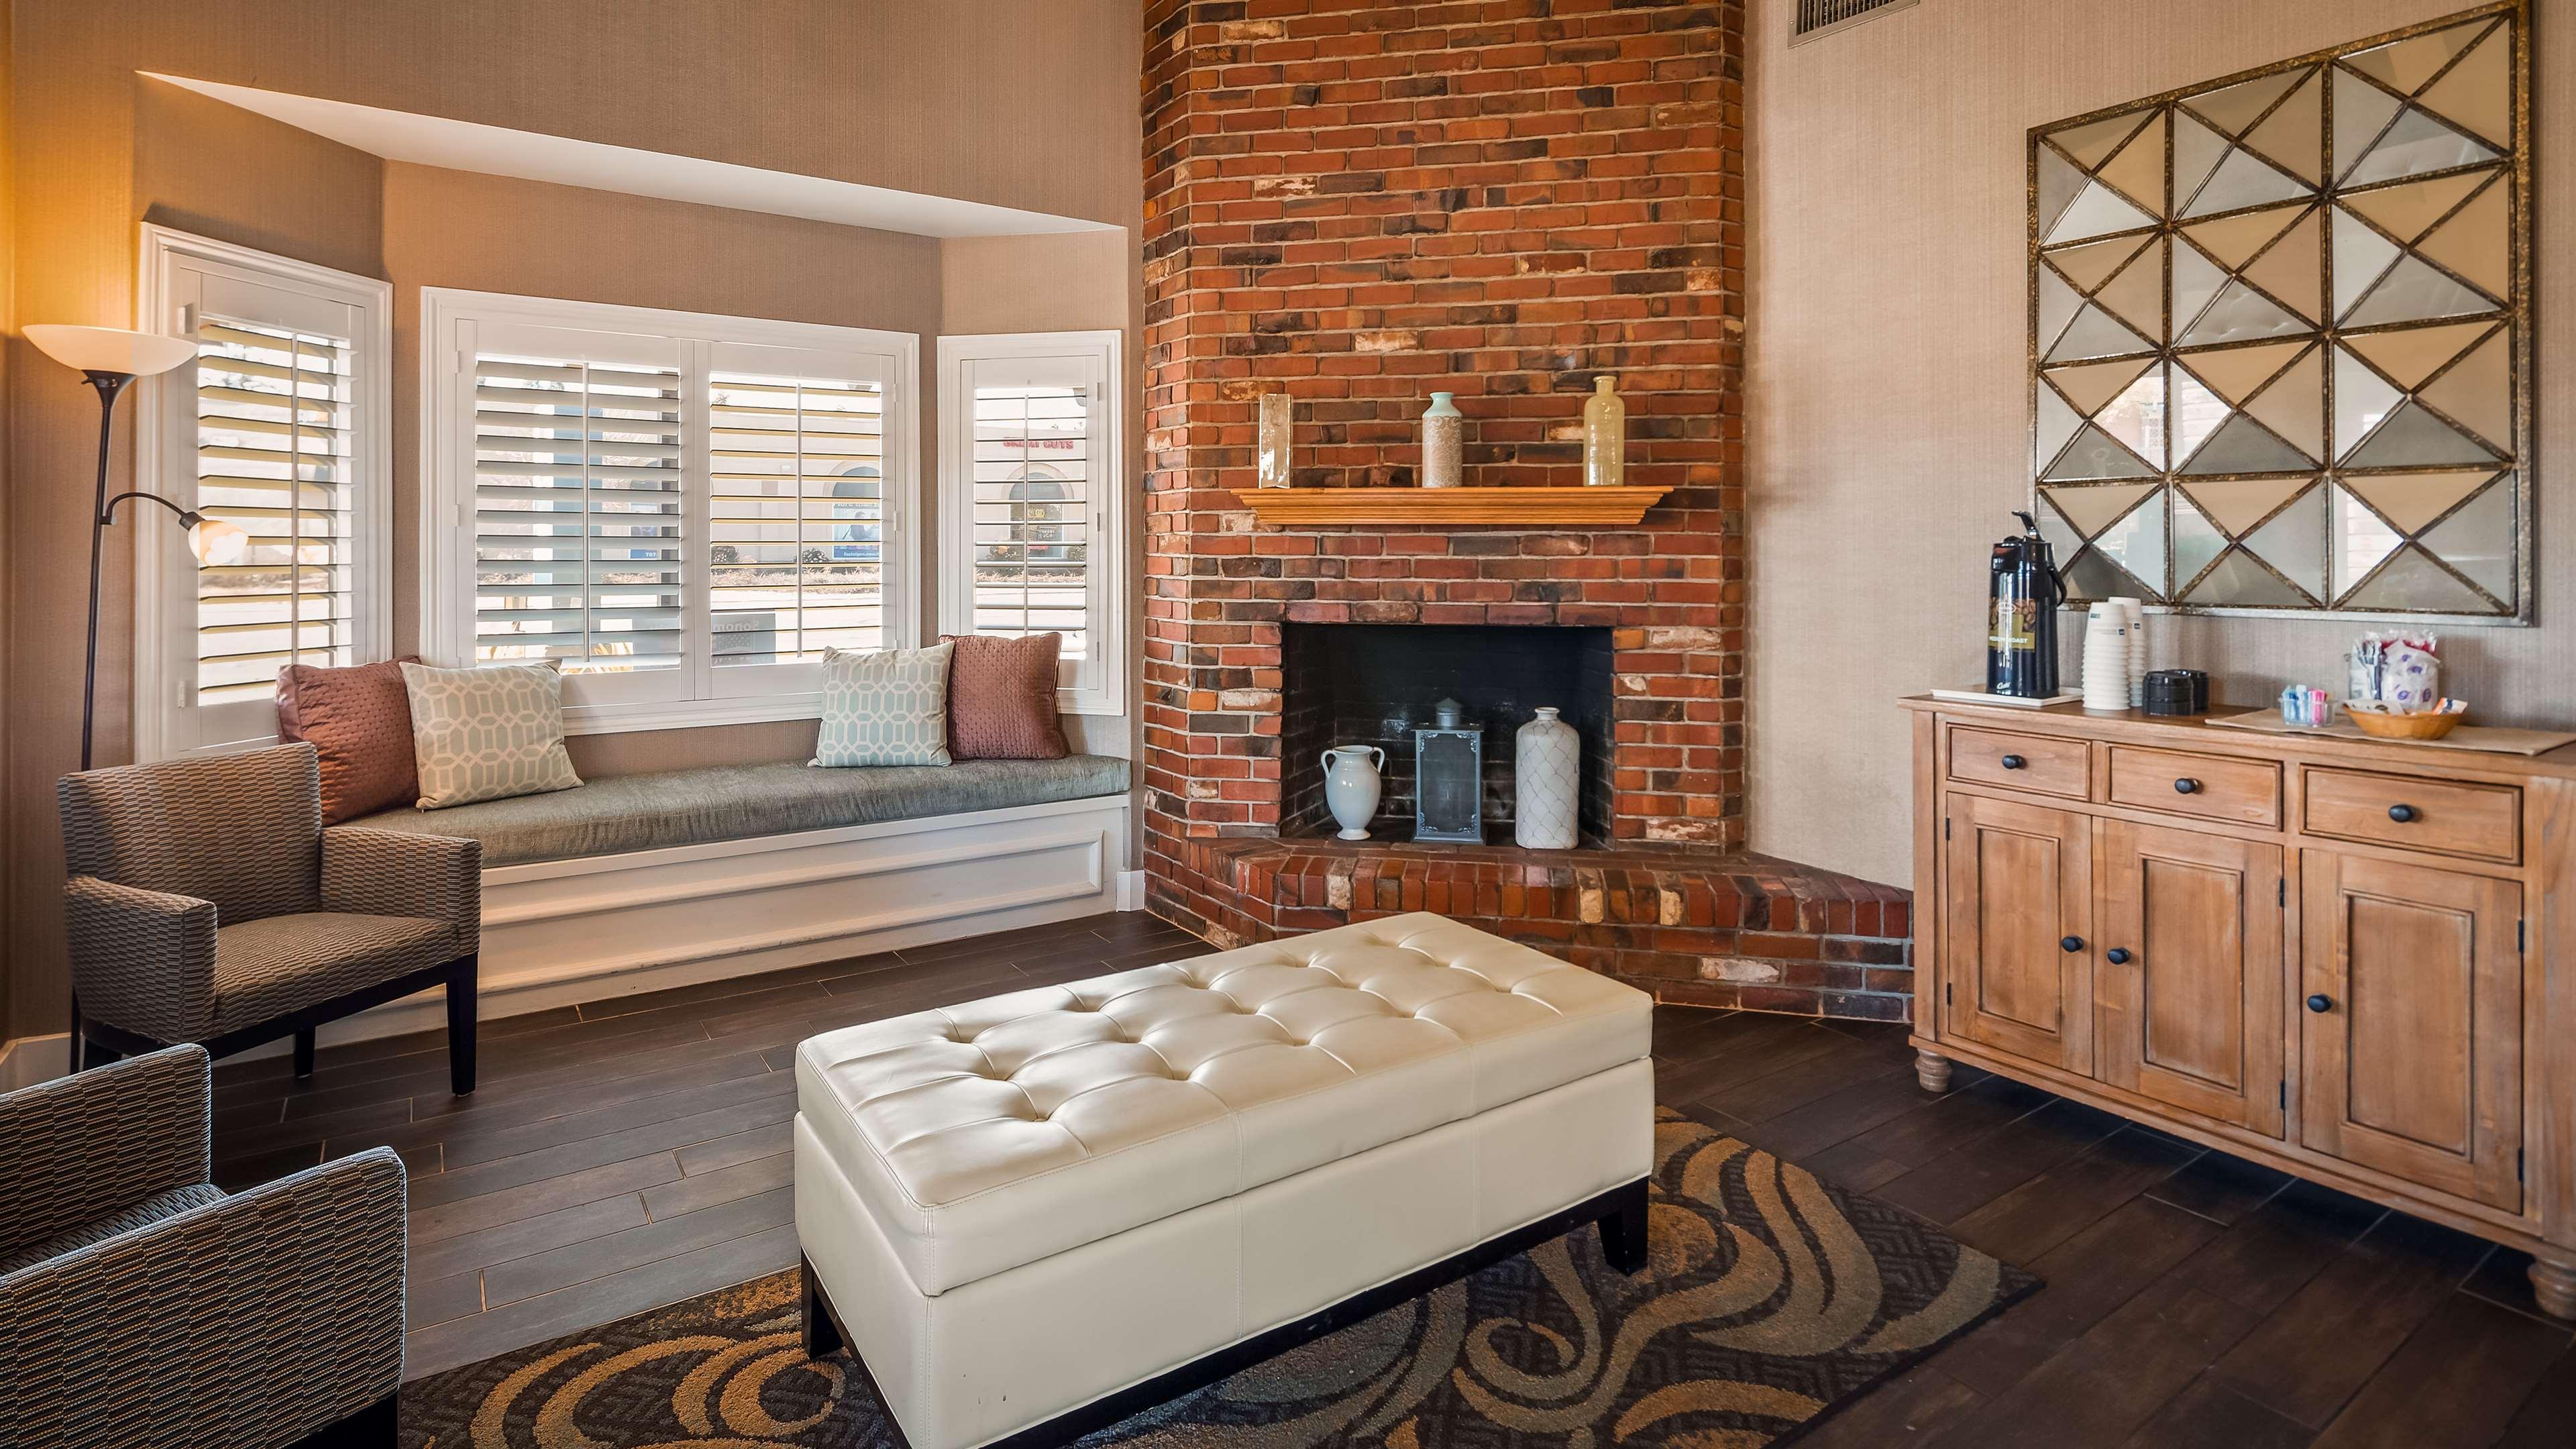 Best Western Garden Inn 1500 Santa Rosa Ave Santa Rosa, CA Hotels .